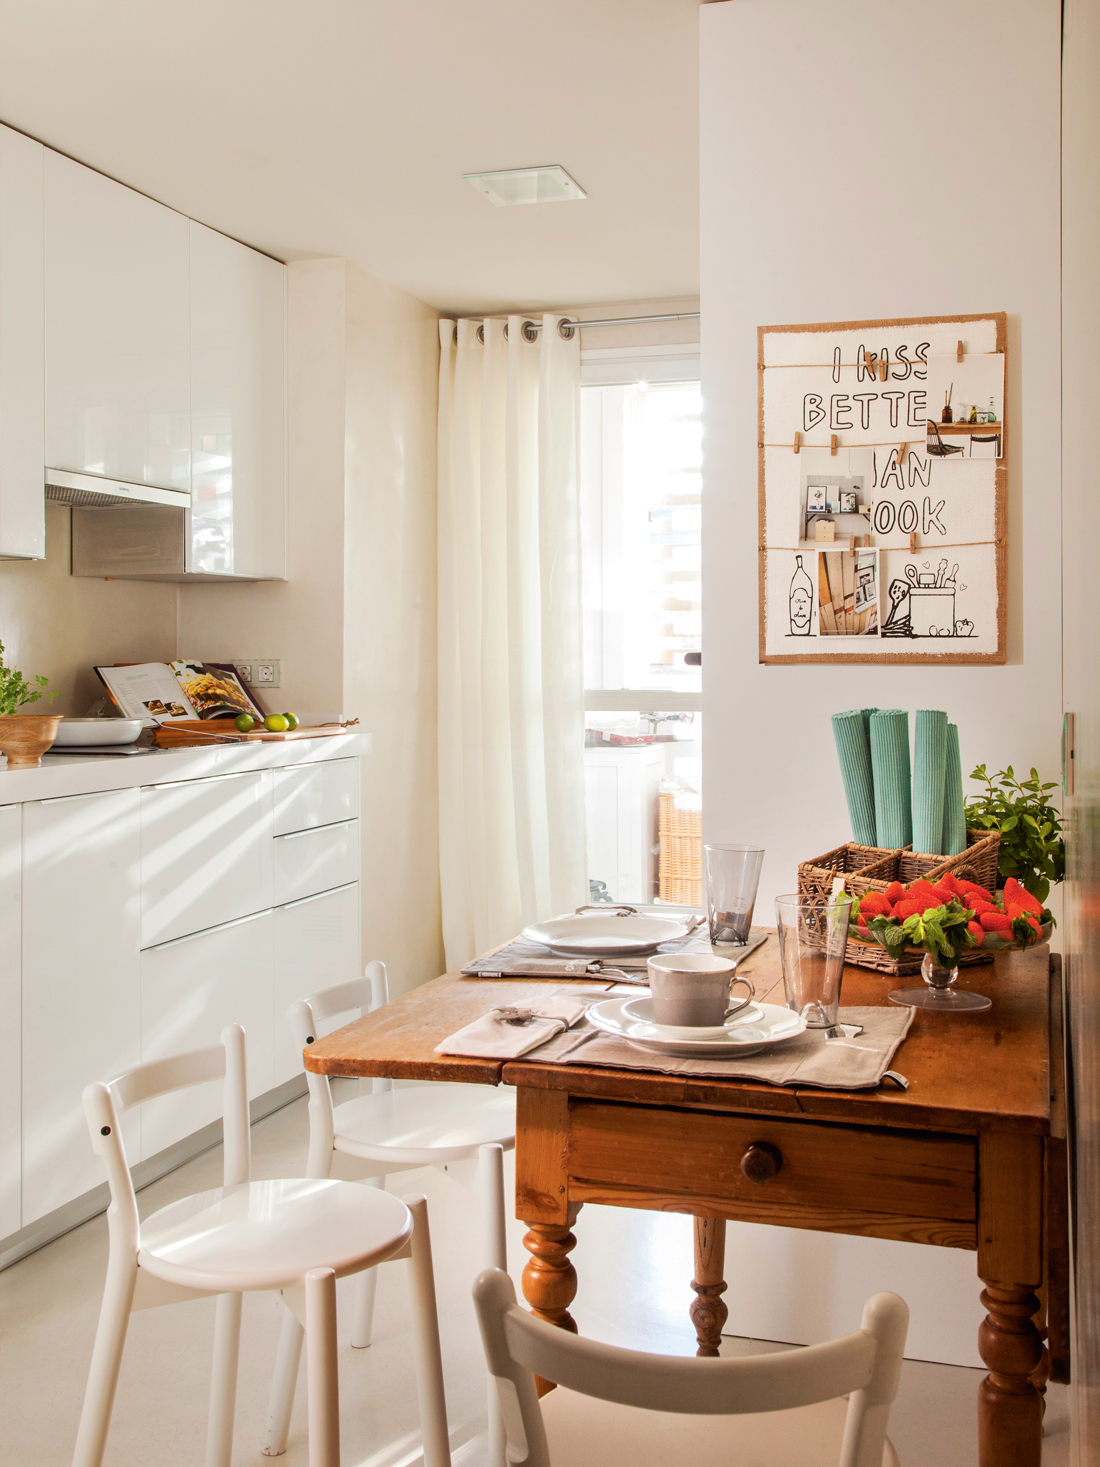 Dale color a tu cocina blanca for Mesa cocina blanca